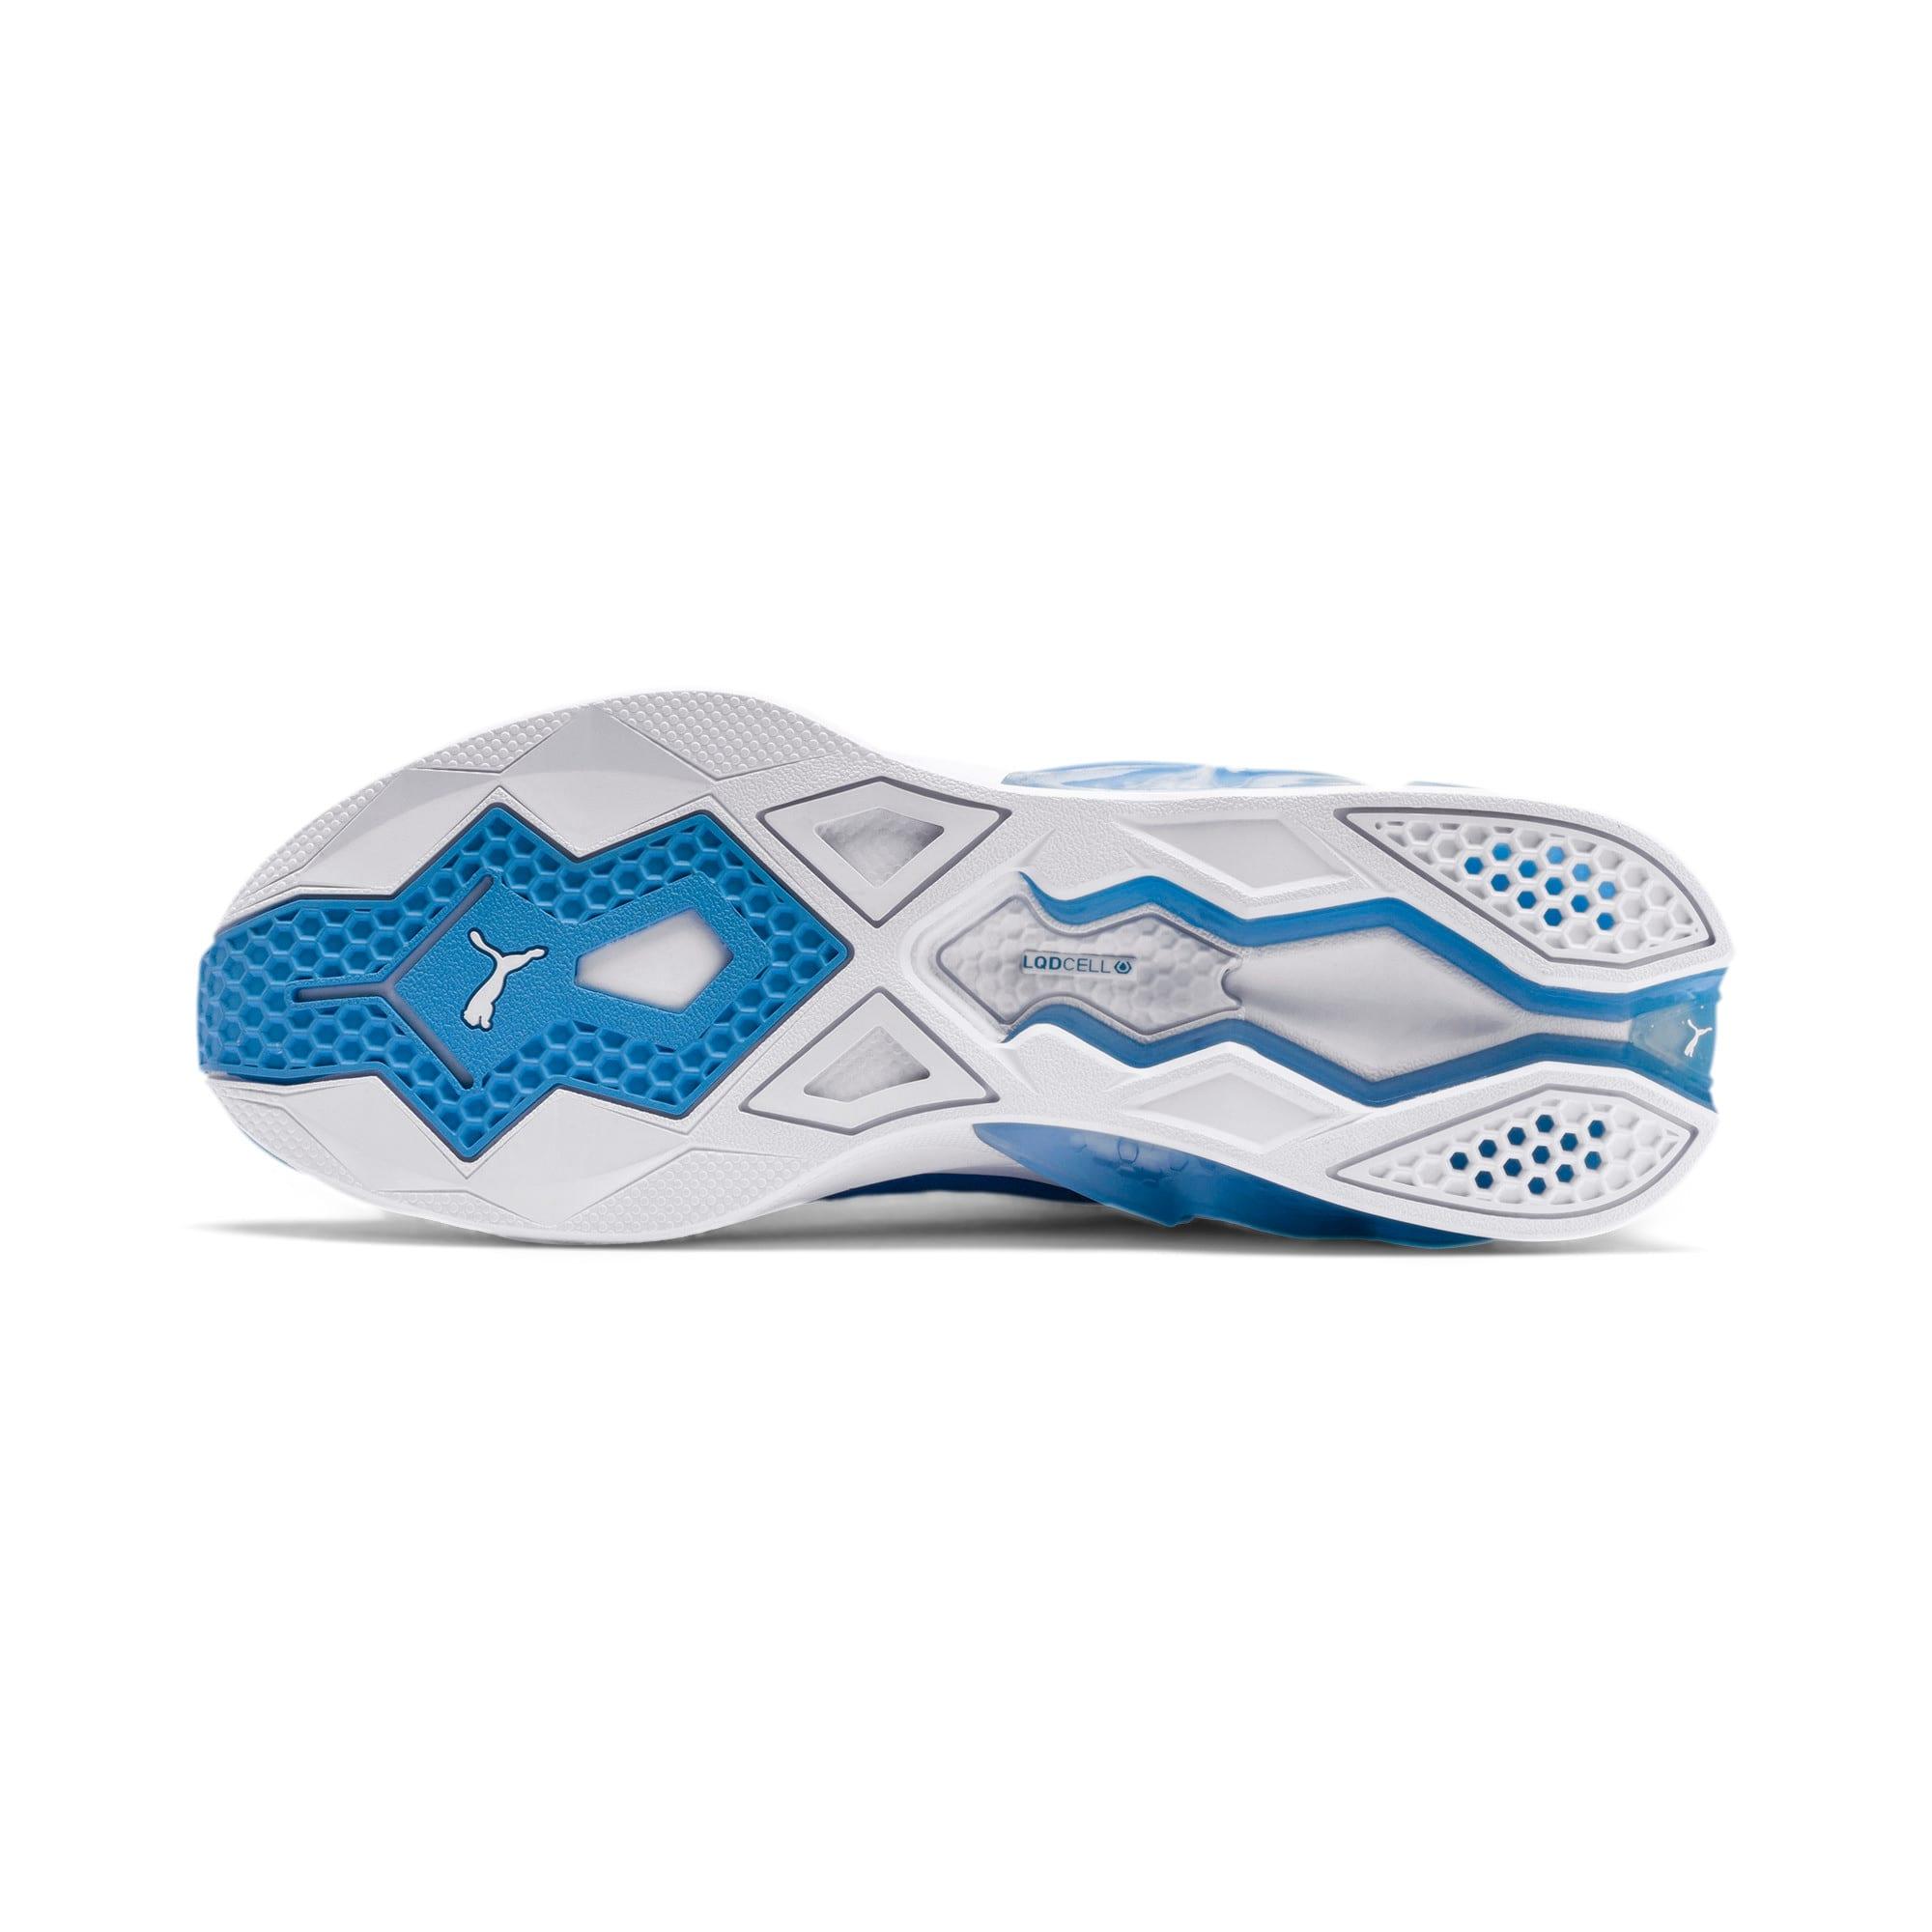 Thumbnail 4 of LQDCELL Origin Herren Sneaker, Puma White-B Blue-Blz Yellow, medium